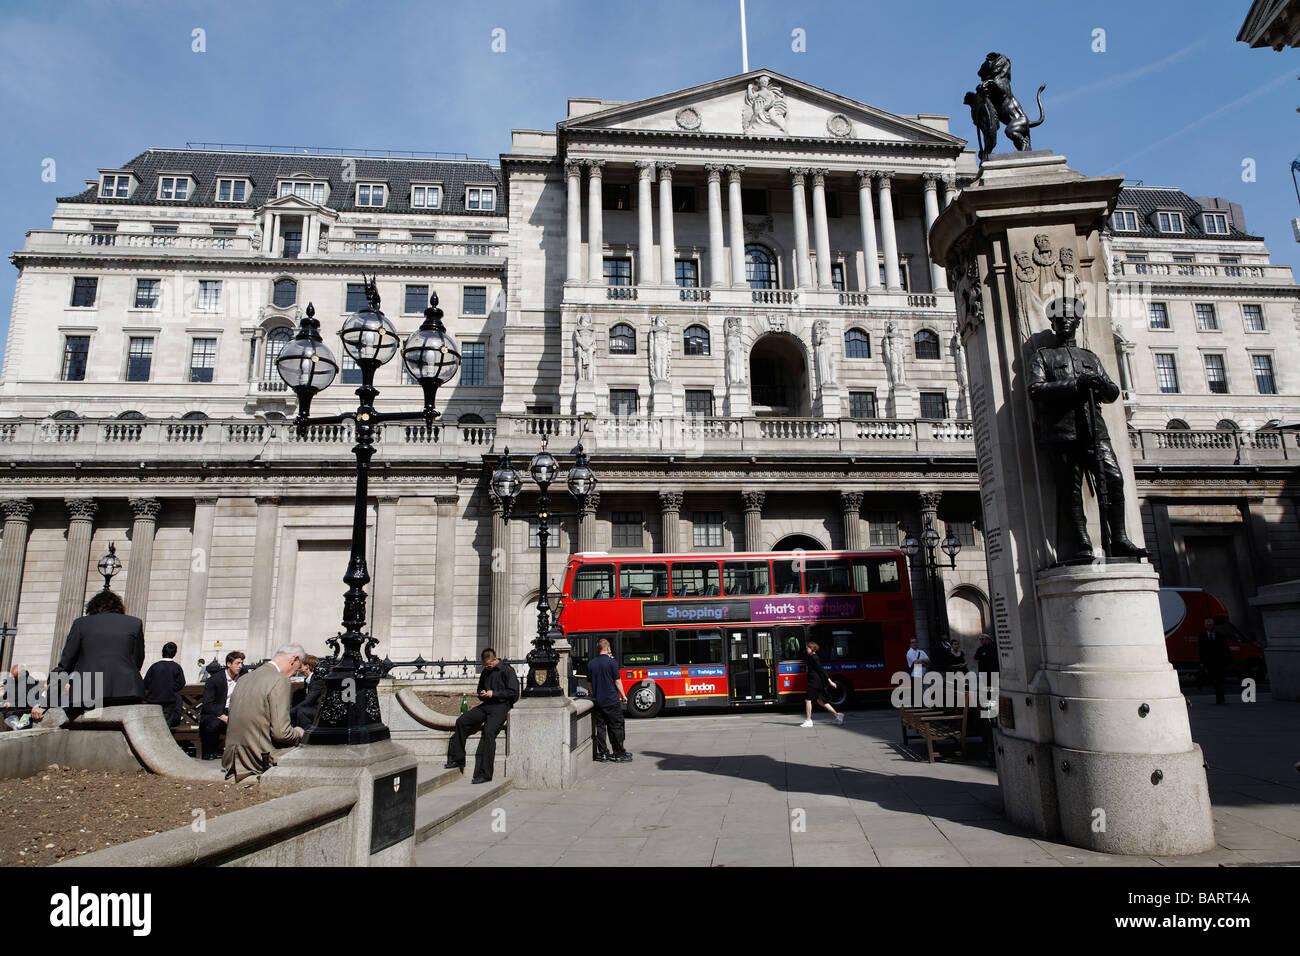 Bank of England Threadneedle Street London England - Stock Image